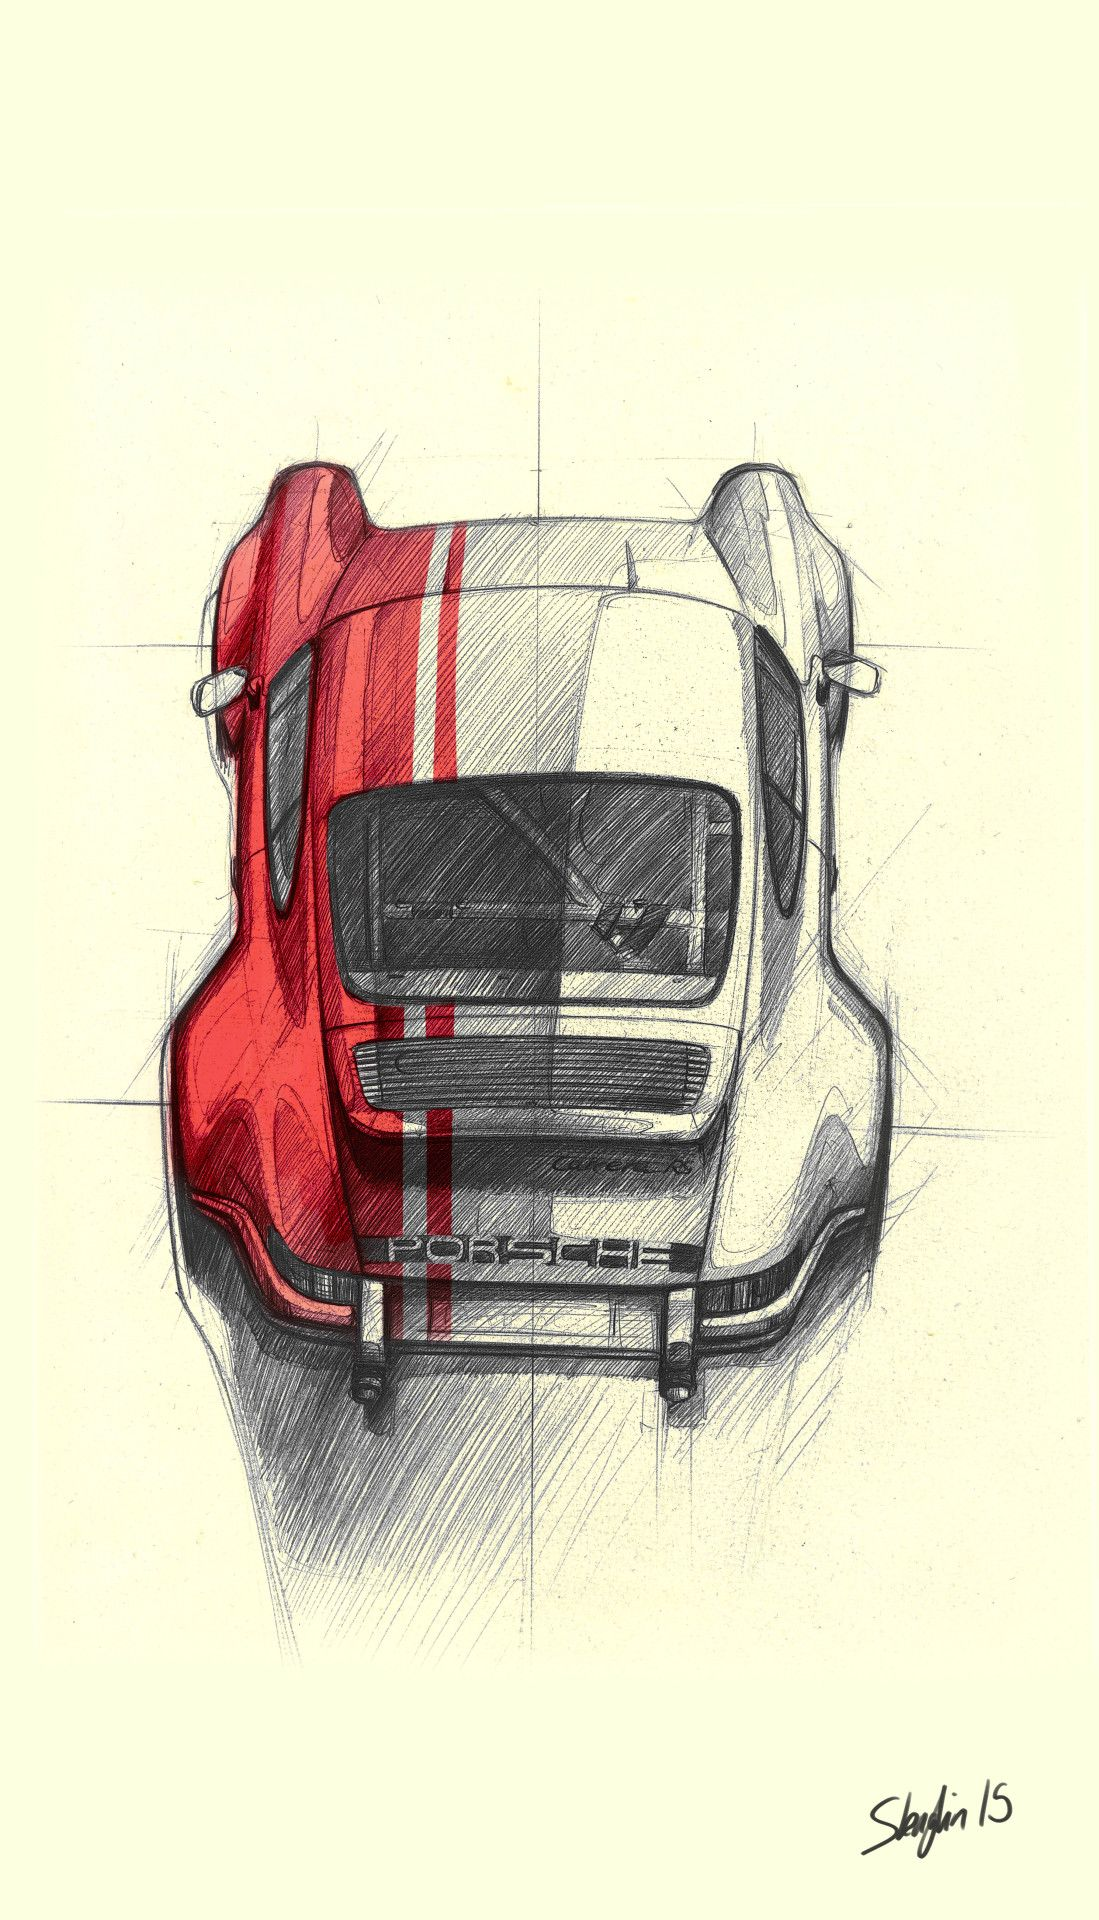 Pin de Fernando RomeroDimas en Dibujos | Pinterest | Motor ...